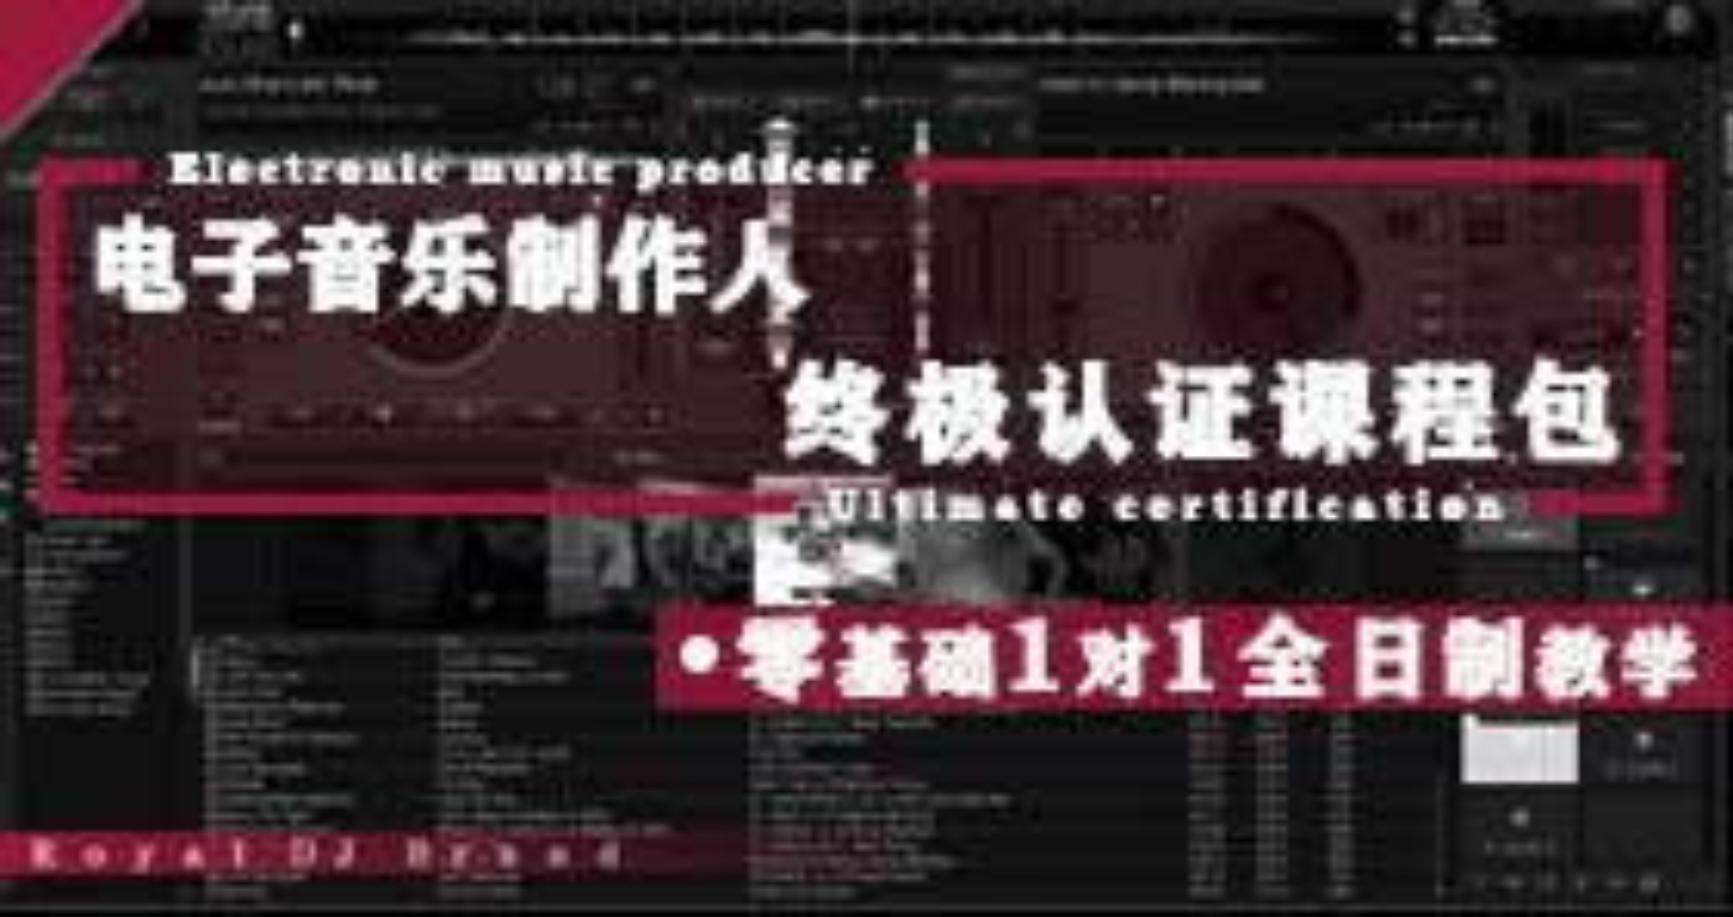 royal DJ 厂牌 电子音乐制作人终极认证课程包